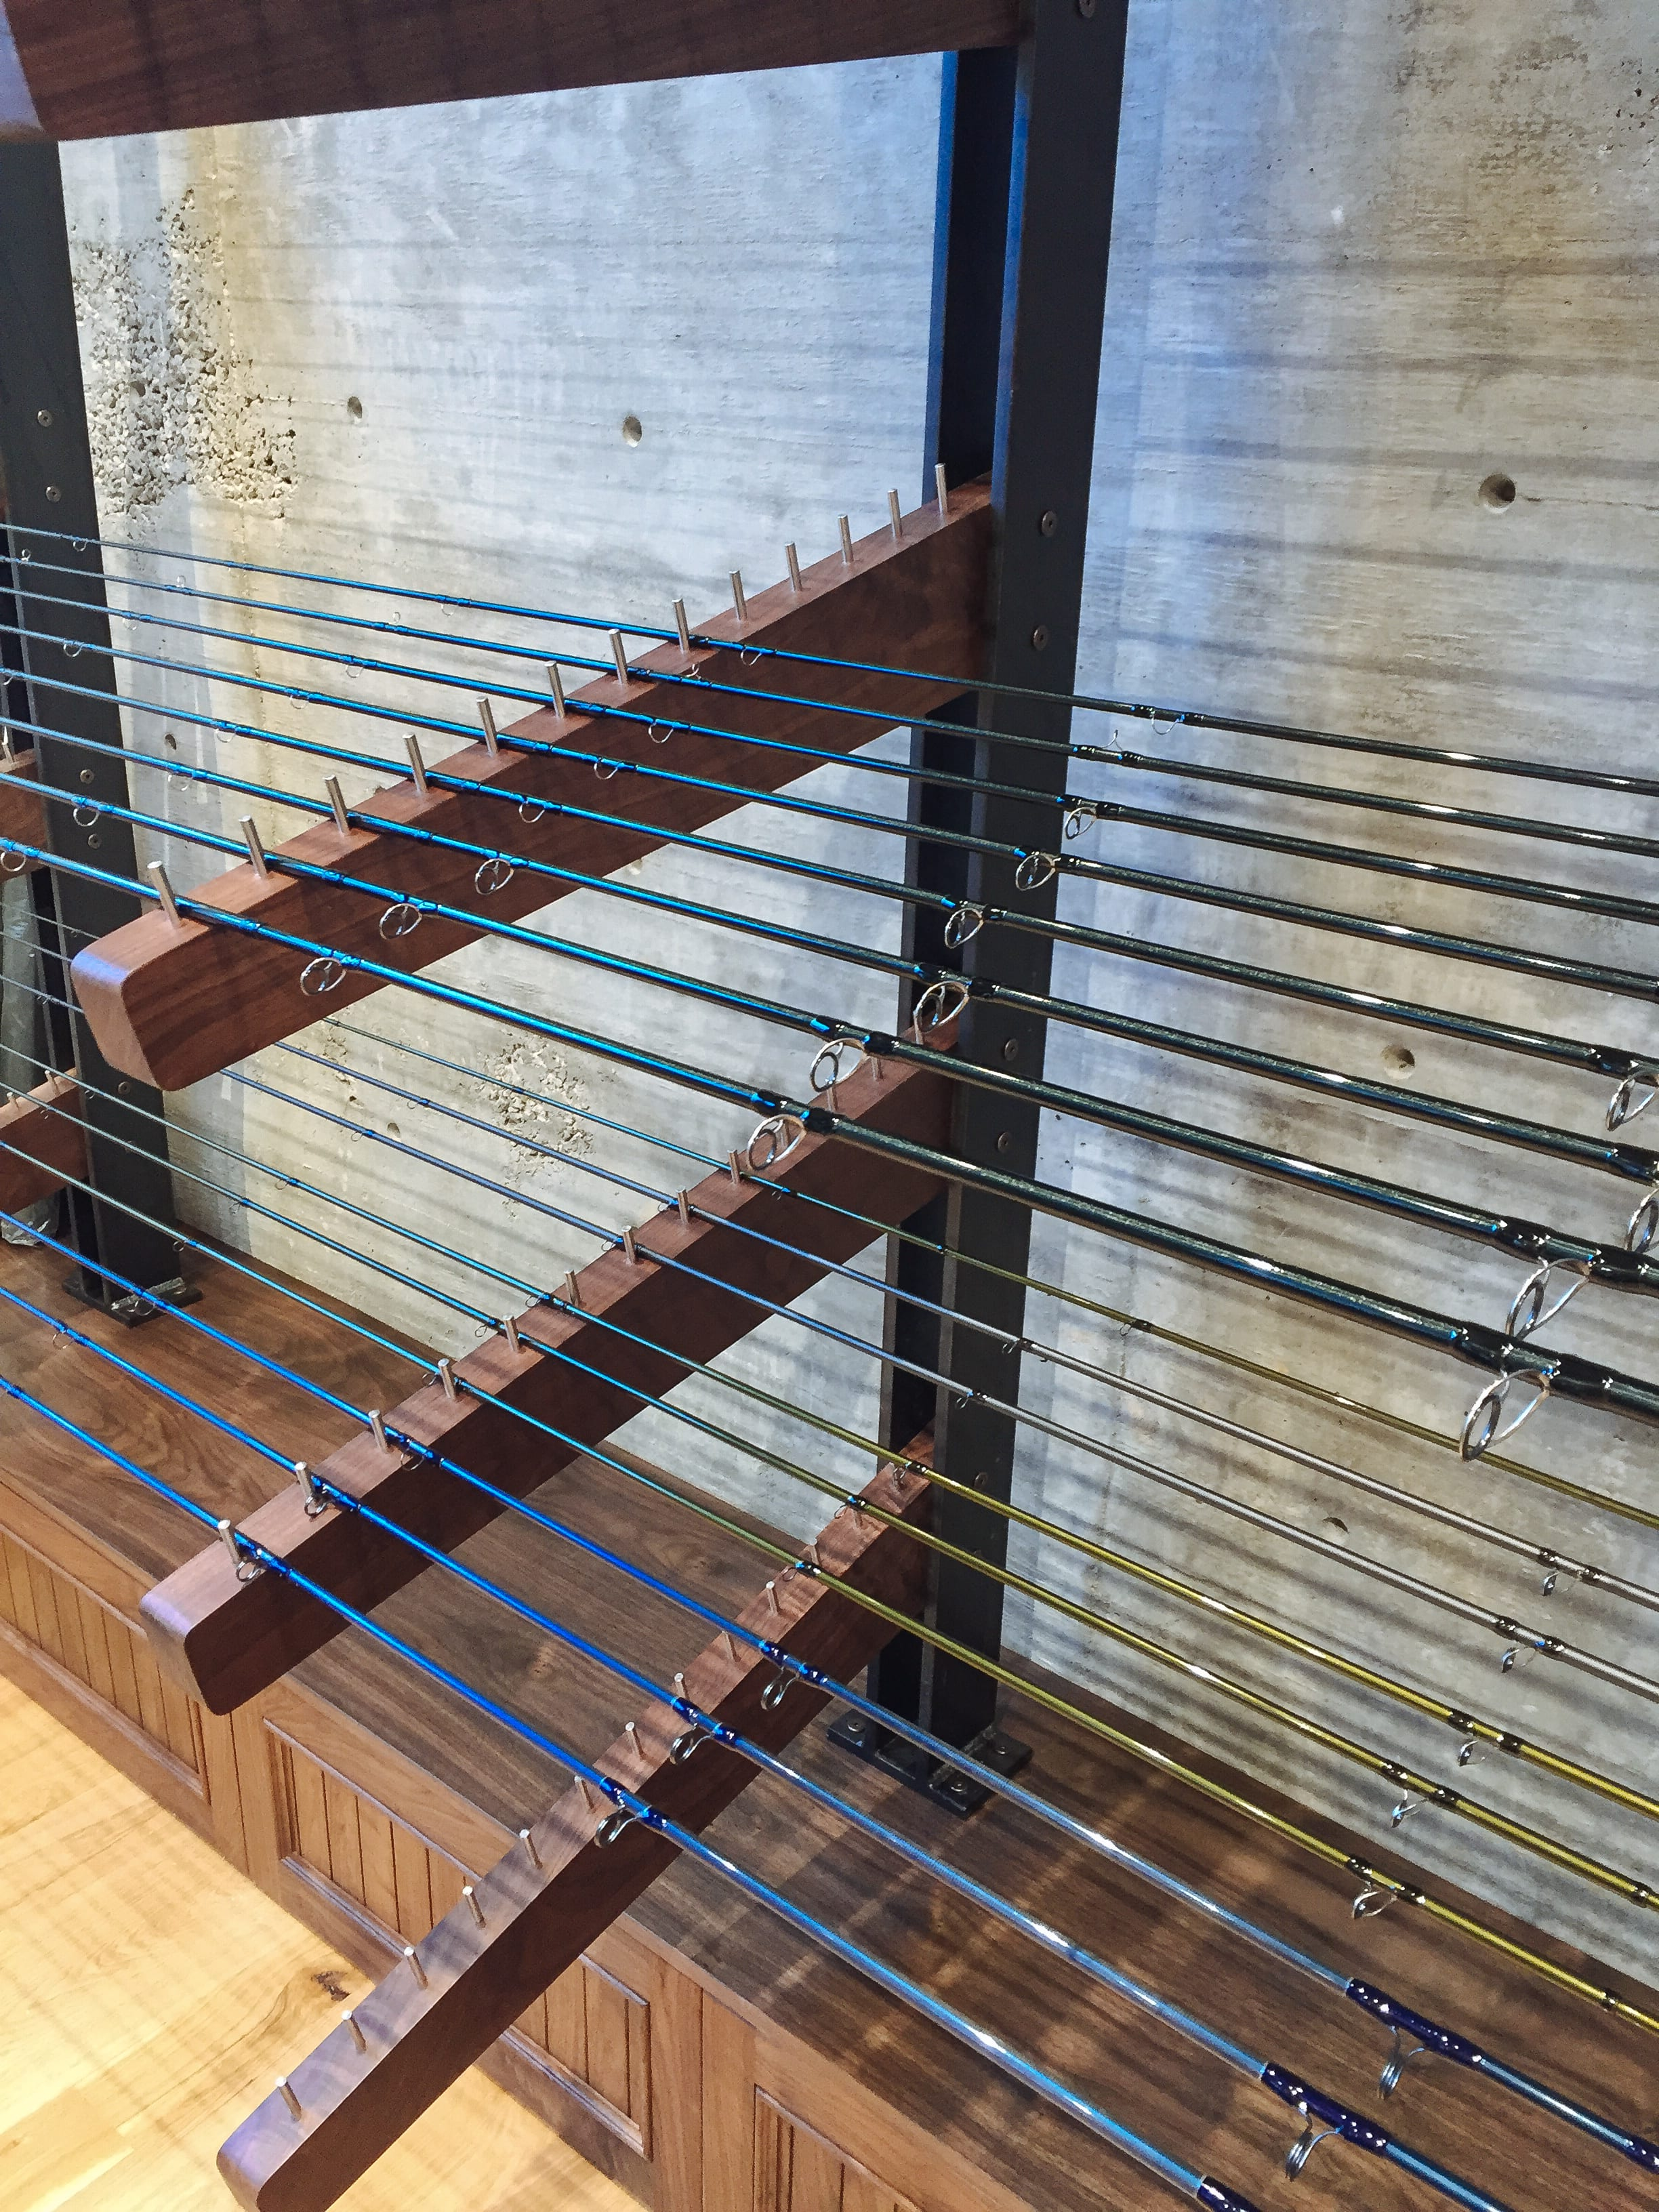 Caliber Sports walnut and steel fishing rod display